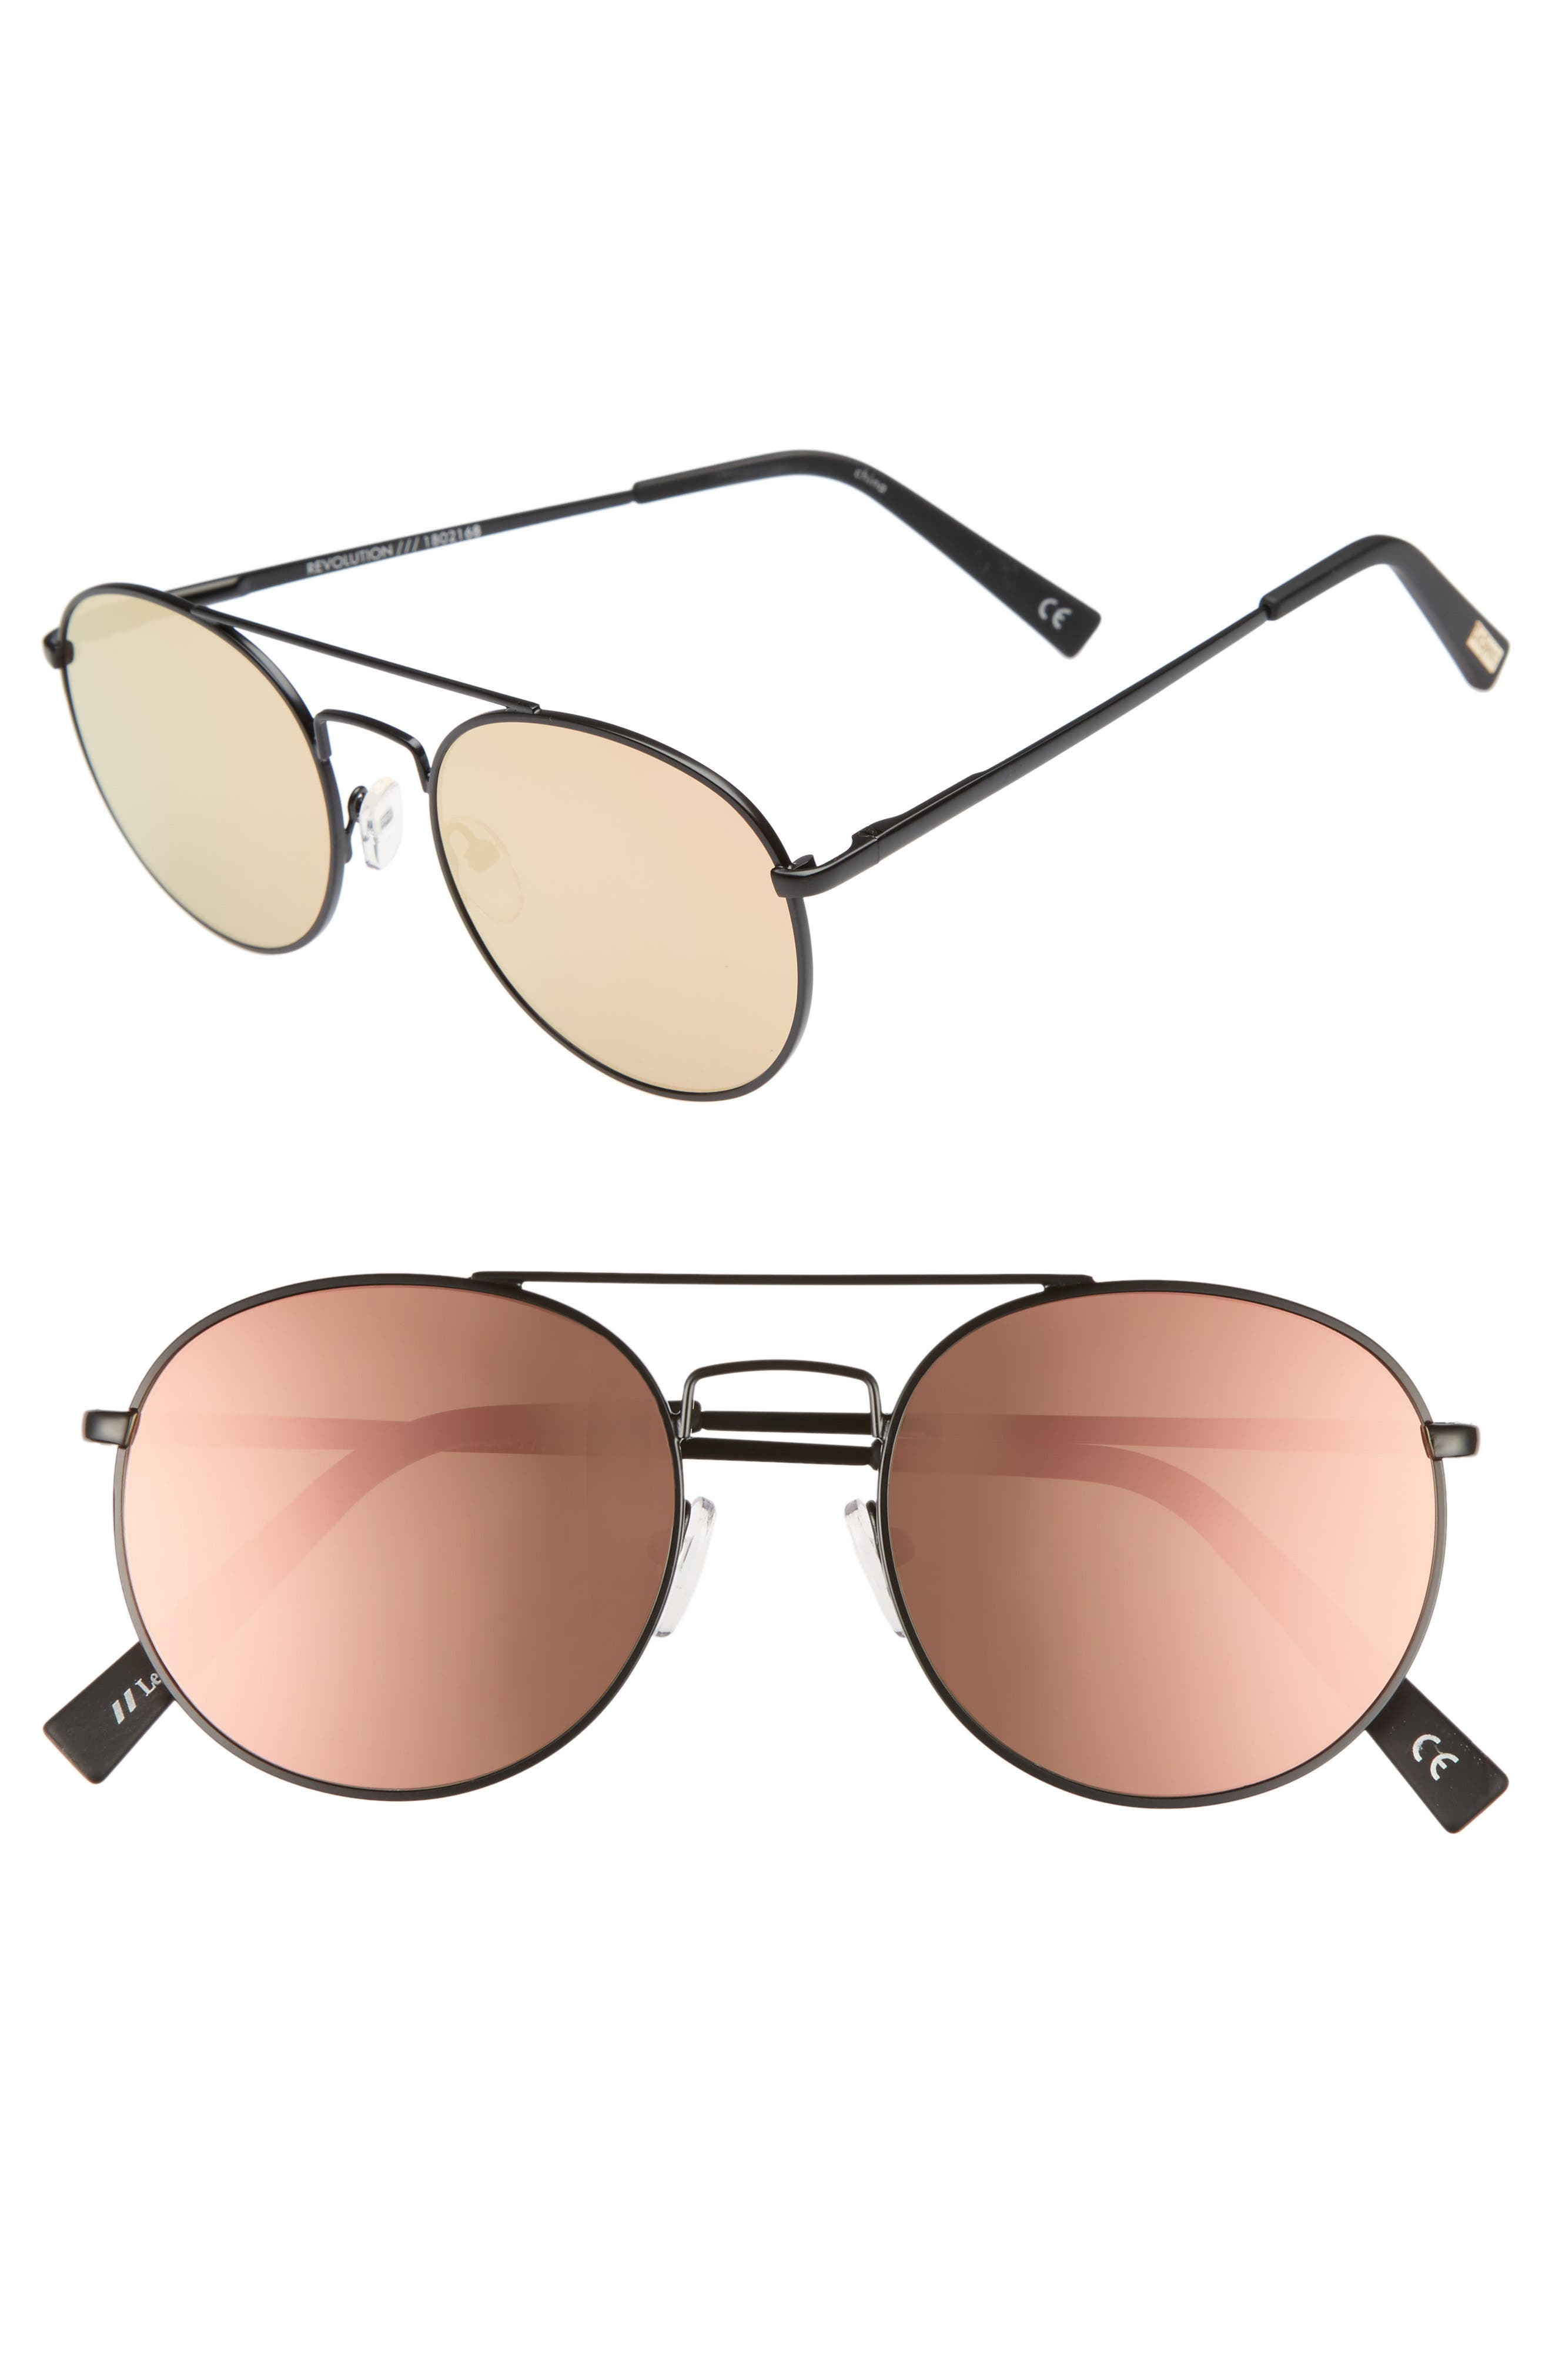 Revolution 53mm Aviator Sunglasses,                         Main,                         color, 001